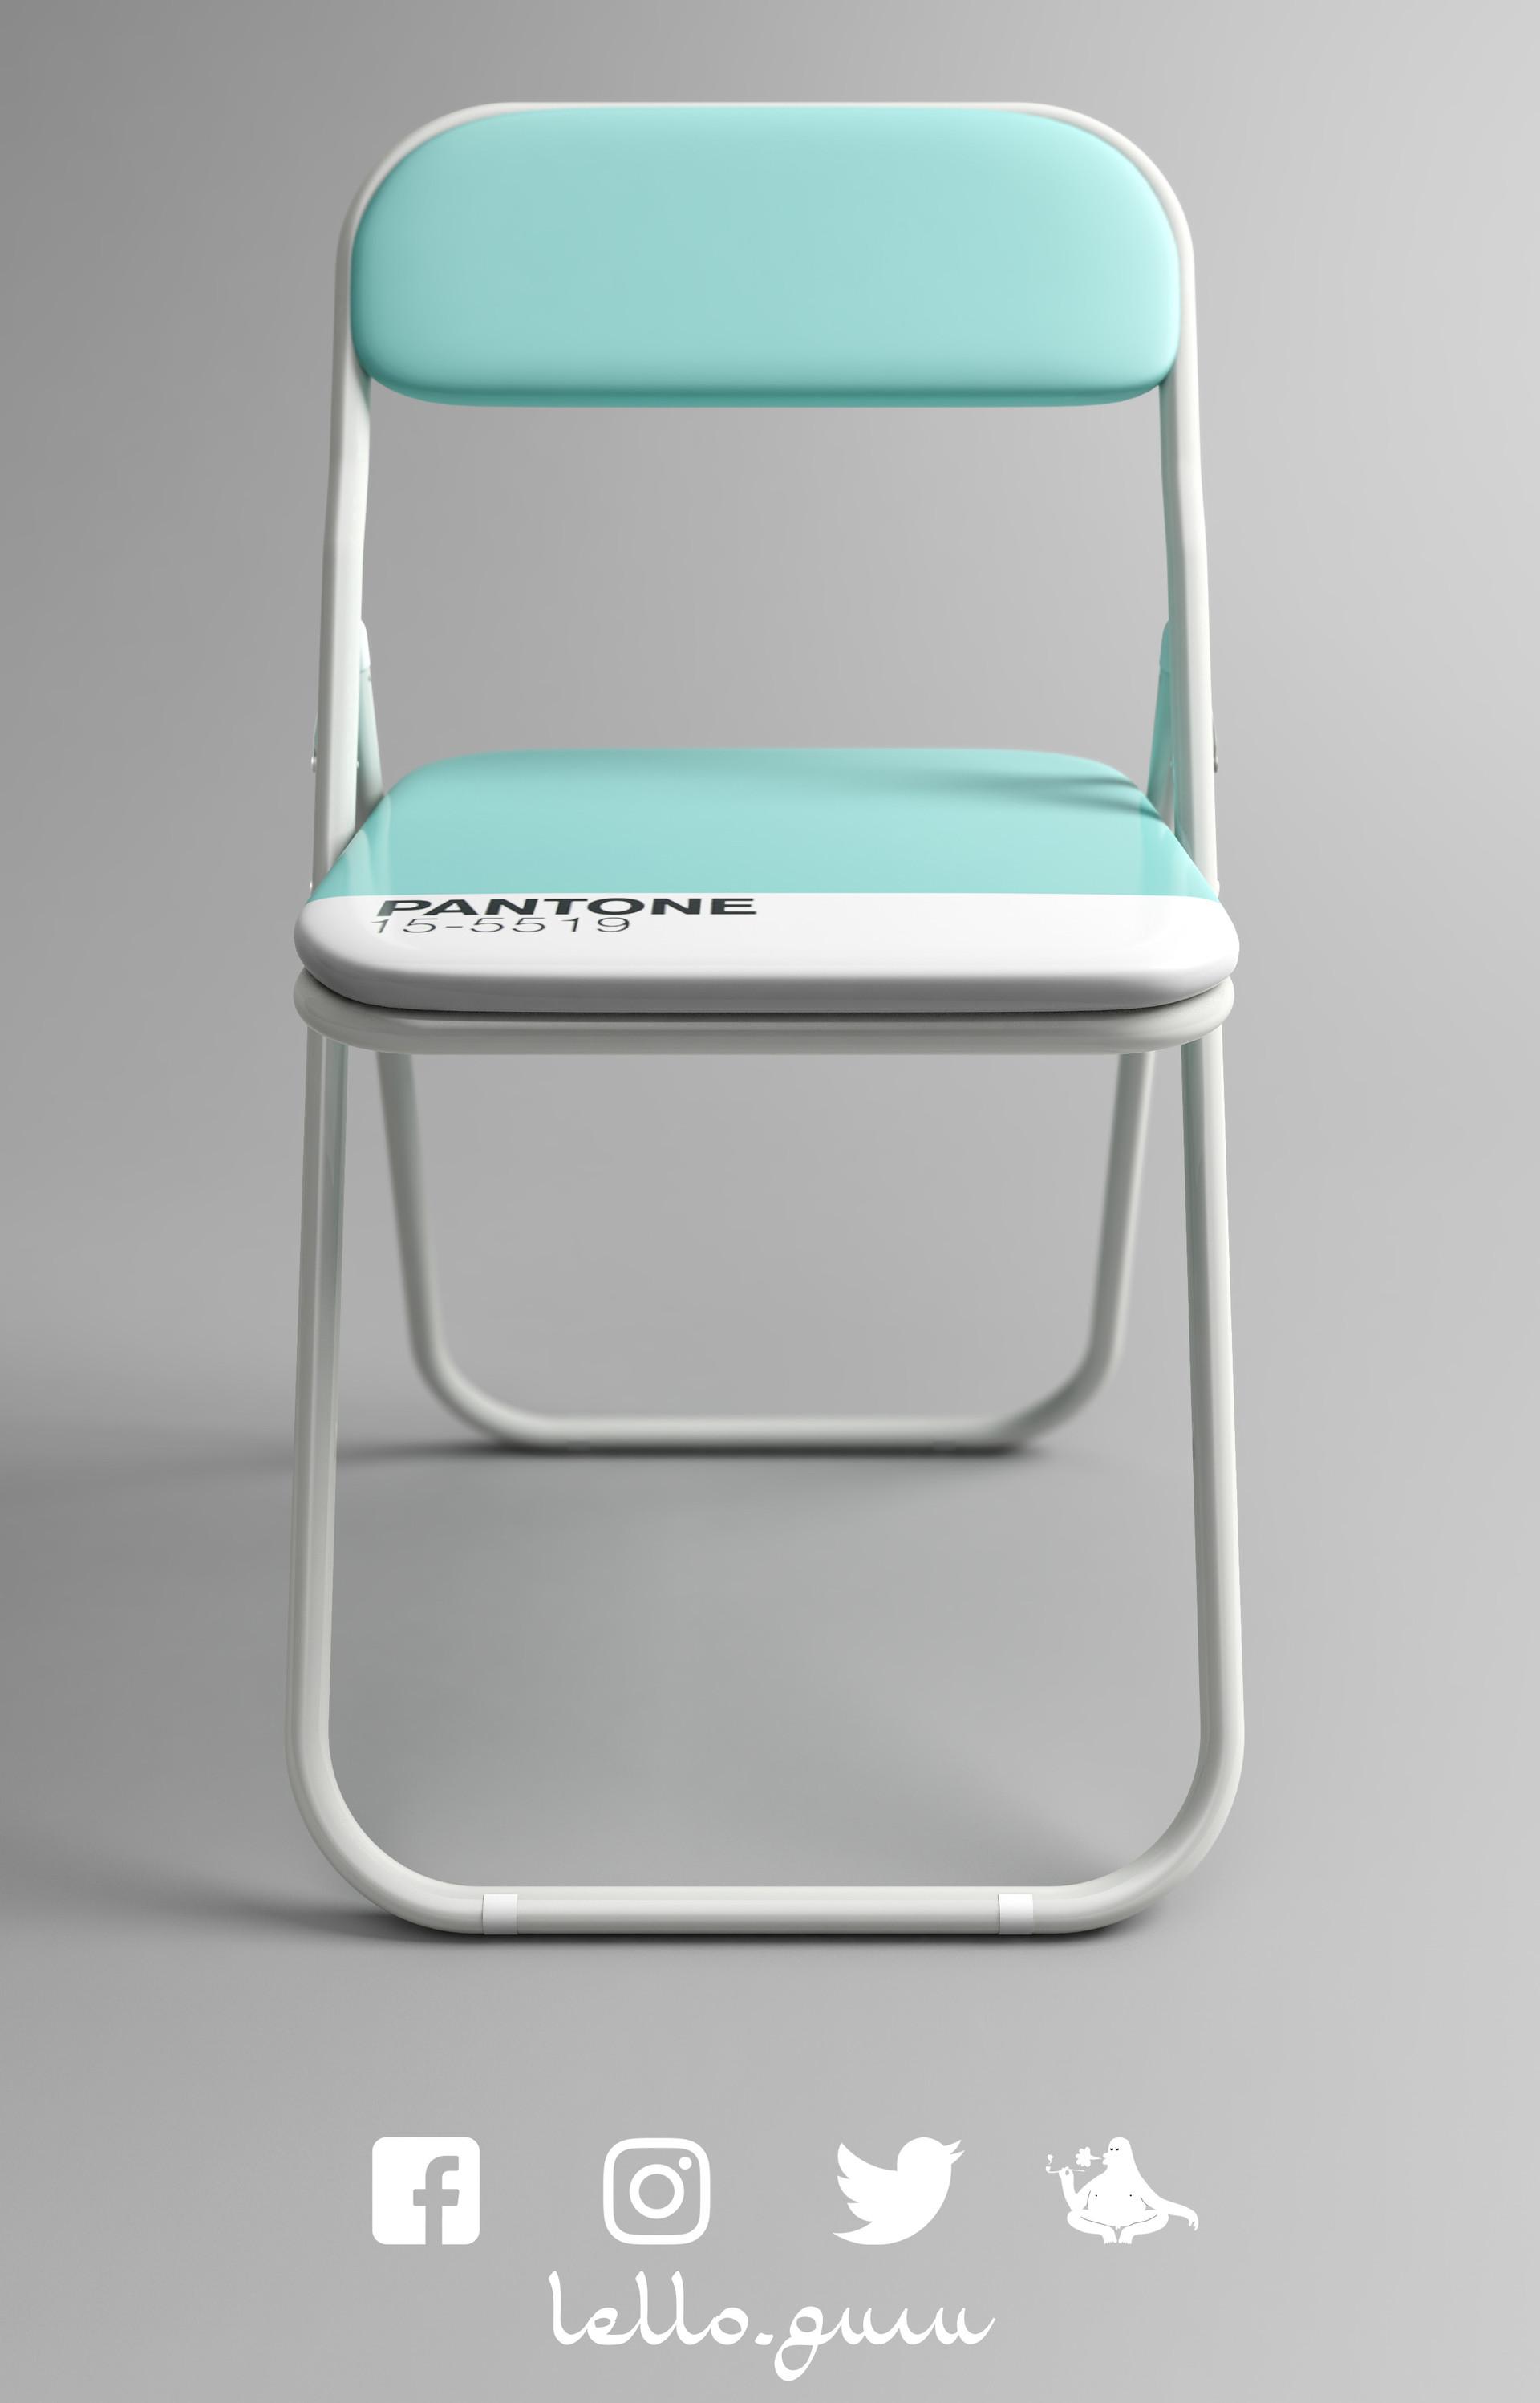 Pantone Stuhl Affordable Pantone Chair With Pantone Stuhl